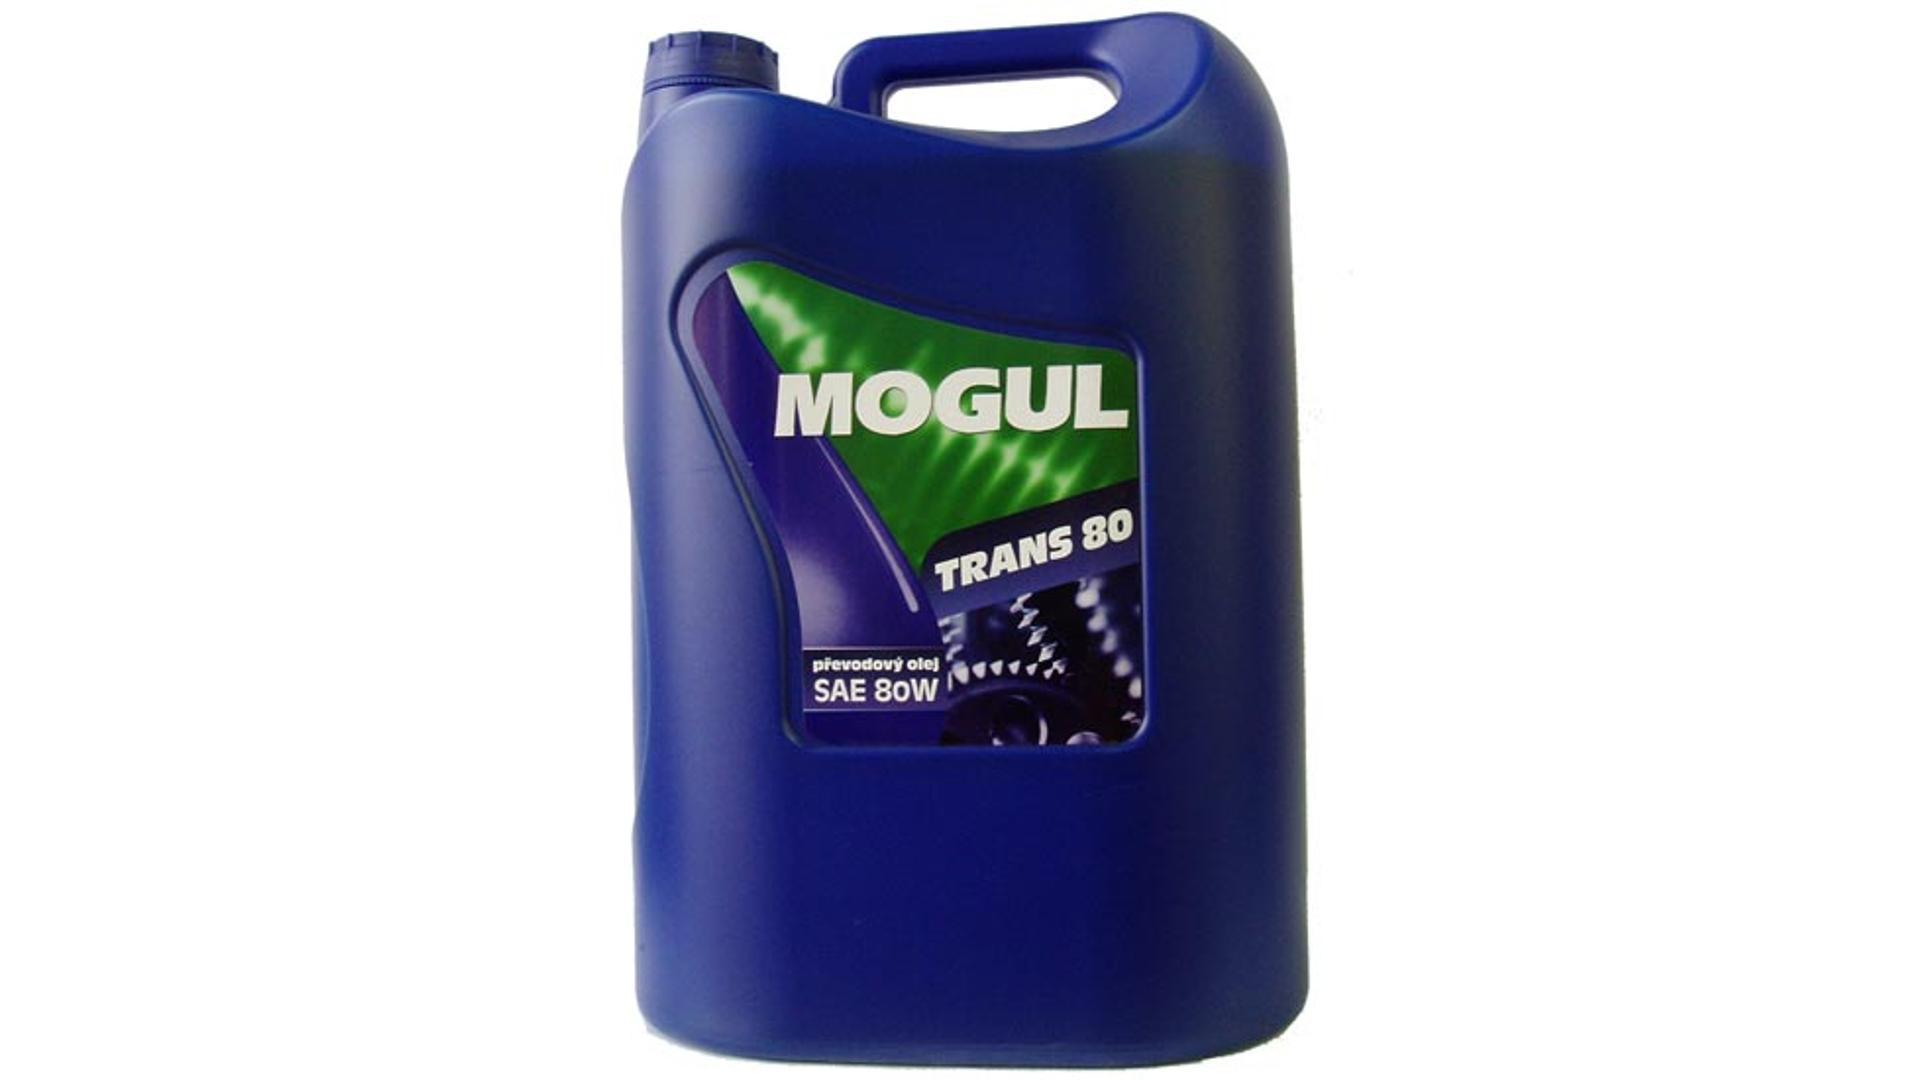 MOGUL TRANS 80 /10